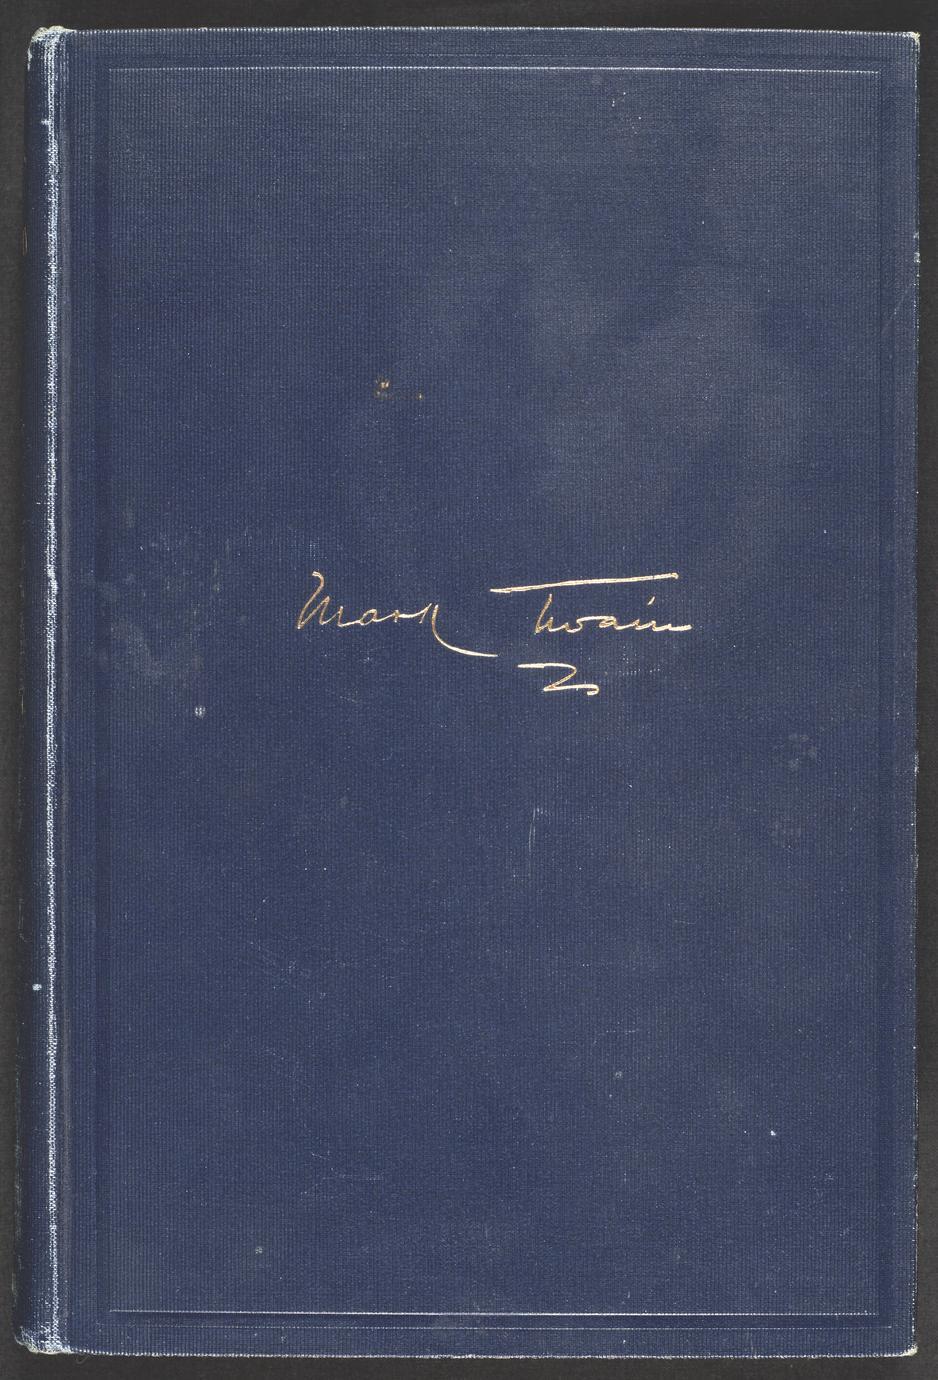 Mark Twain's autobiography (1 of 2)